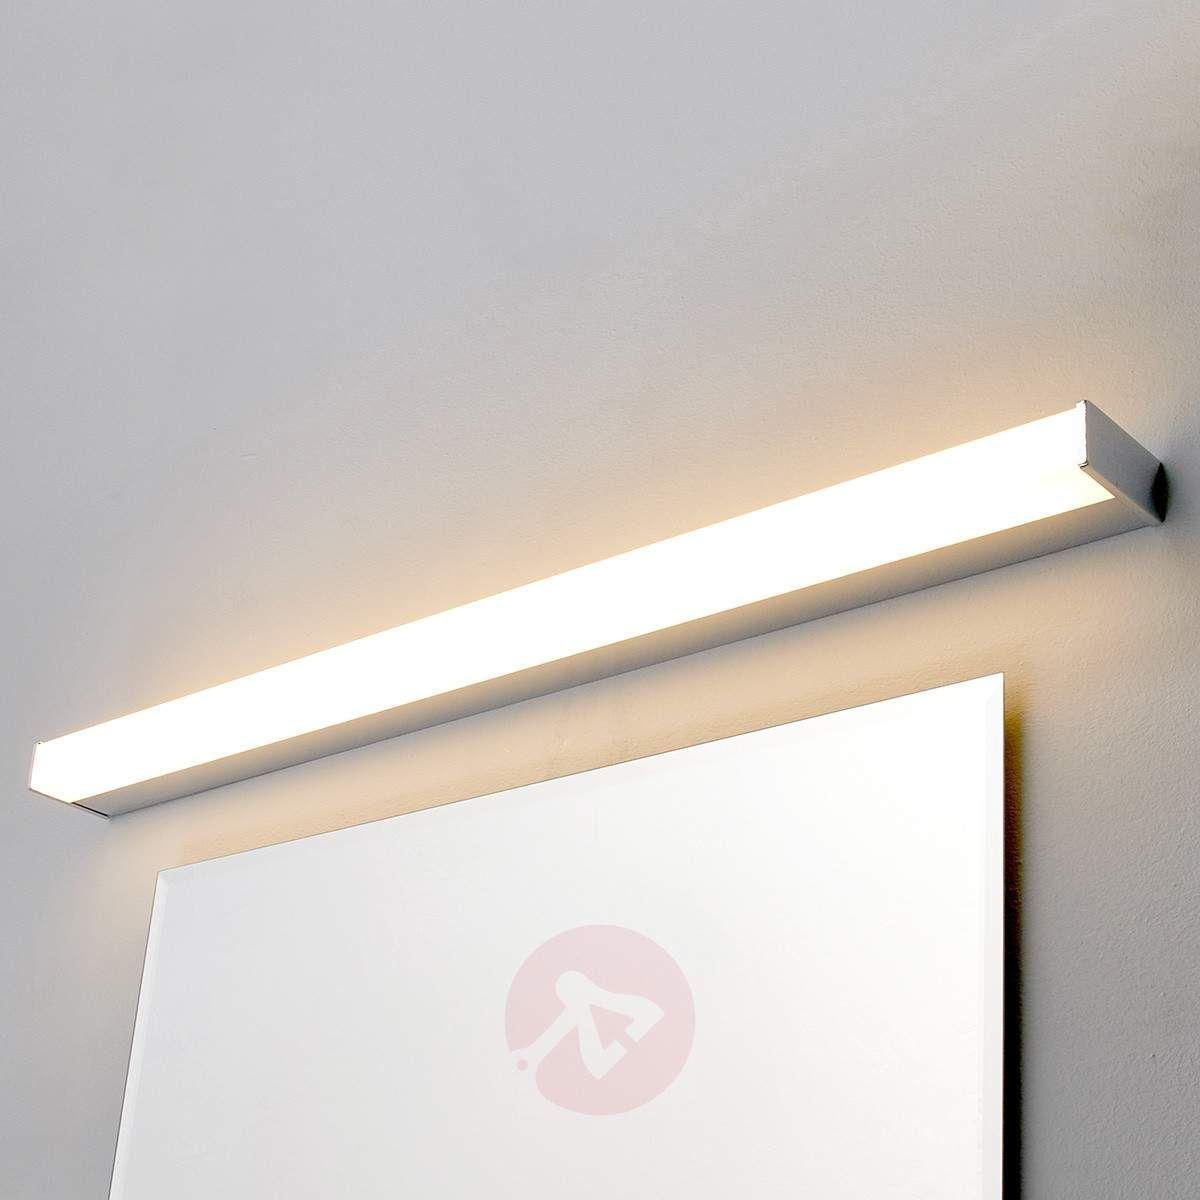 Philippa Bathroom Wall Light-9641016-30 | SR2 | Pinterest | Bathroom ...